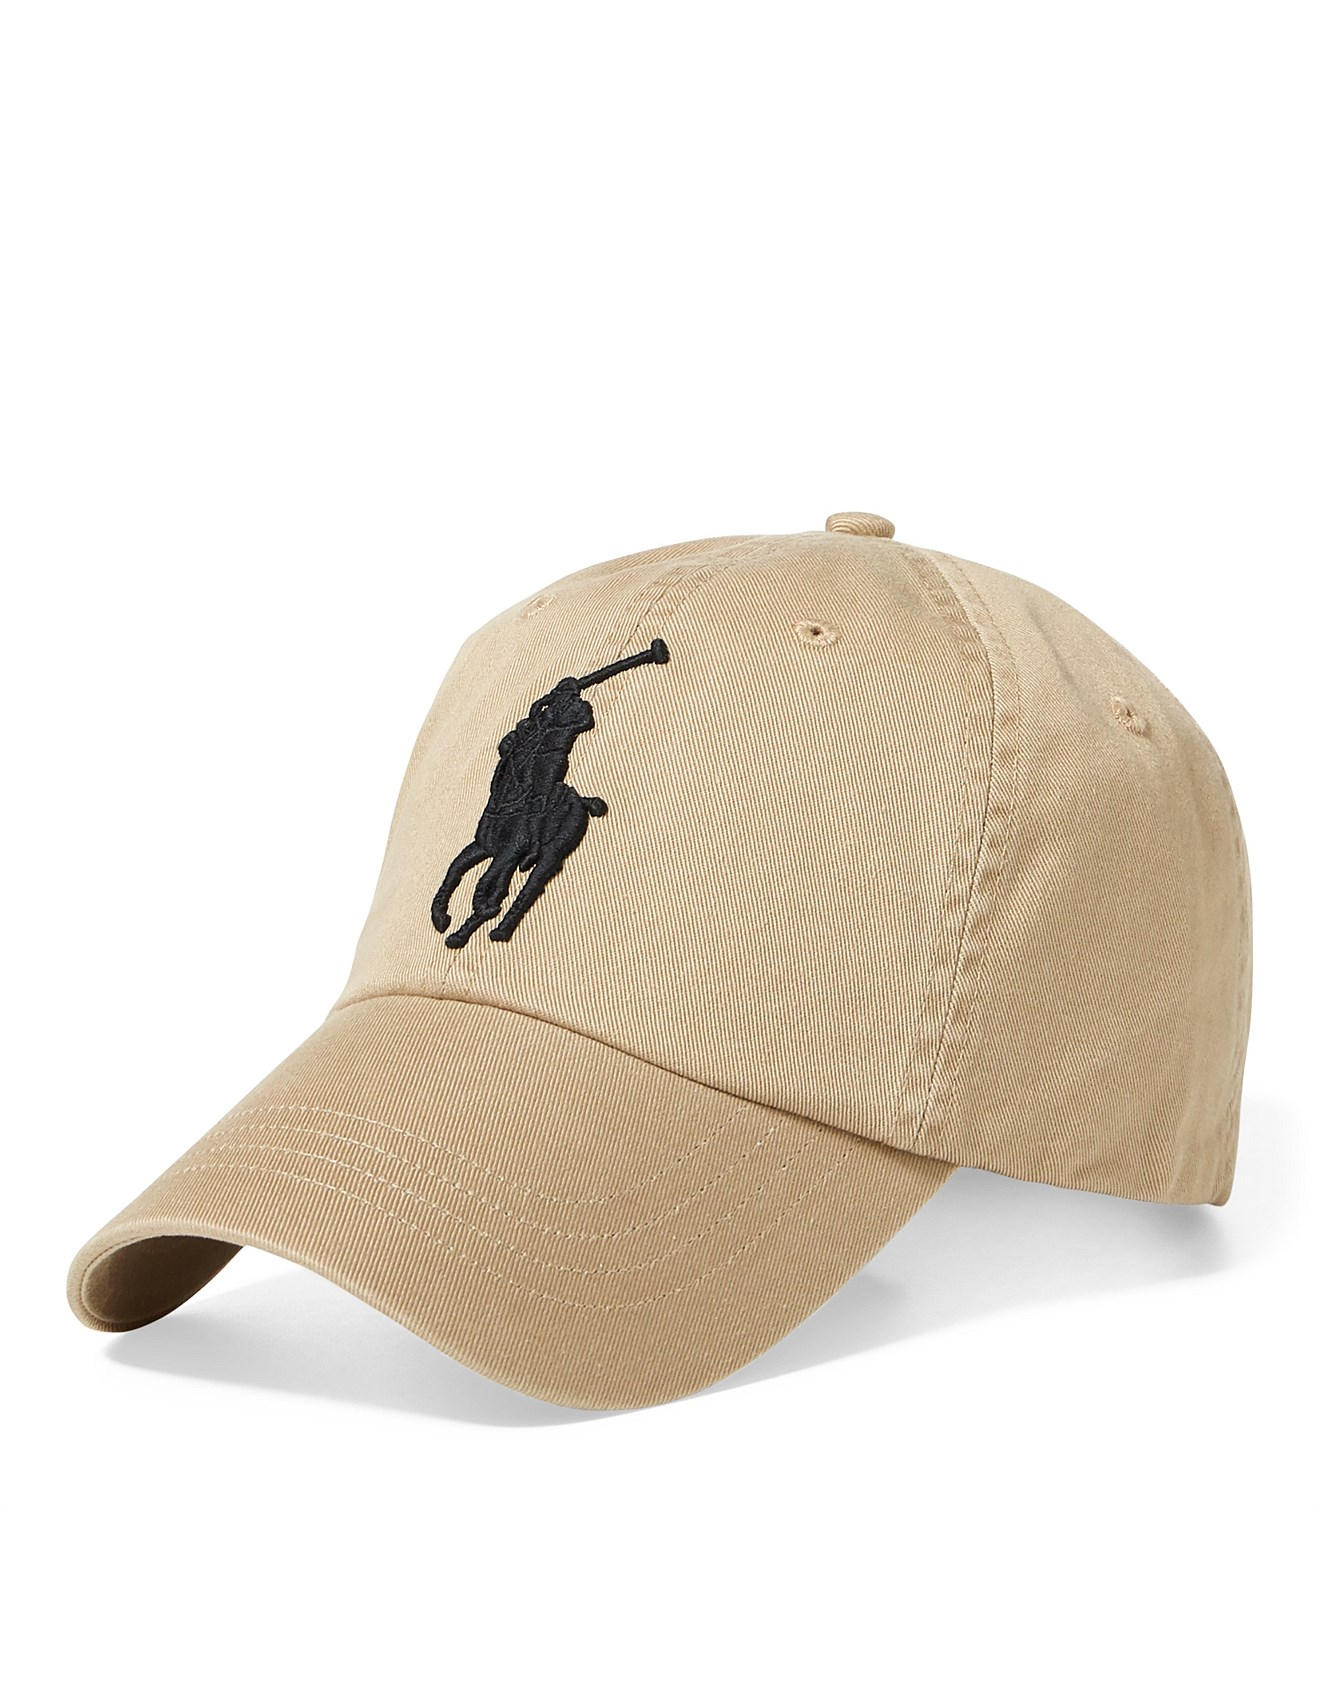 1bcd64fdf Mens Big Pony Chino Baseball Cap